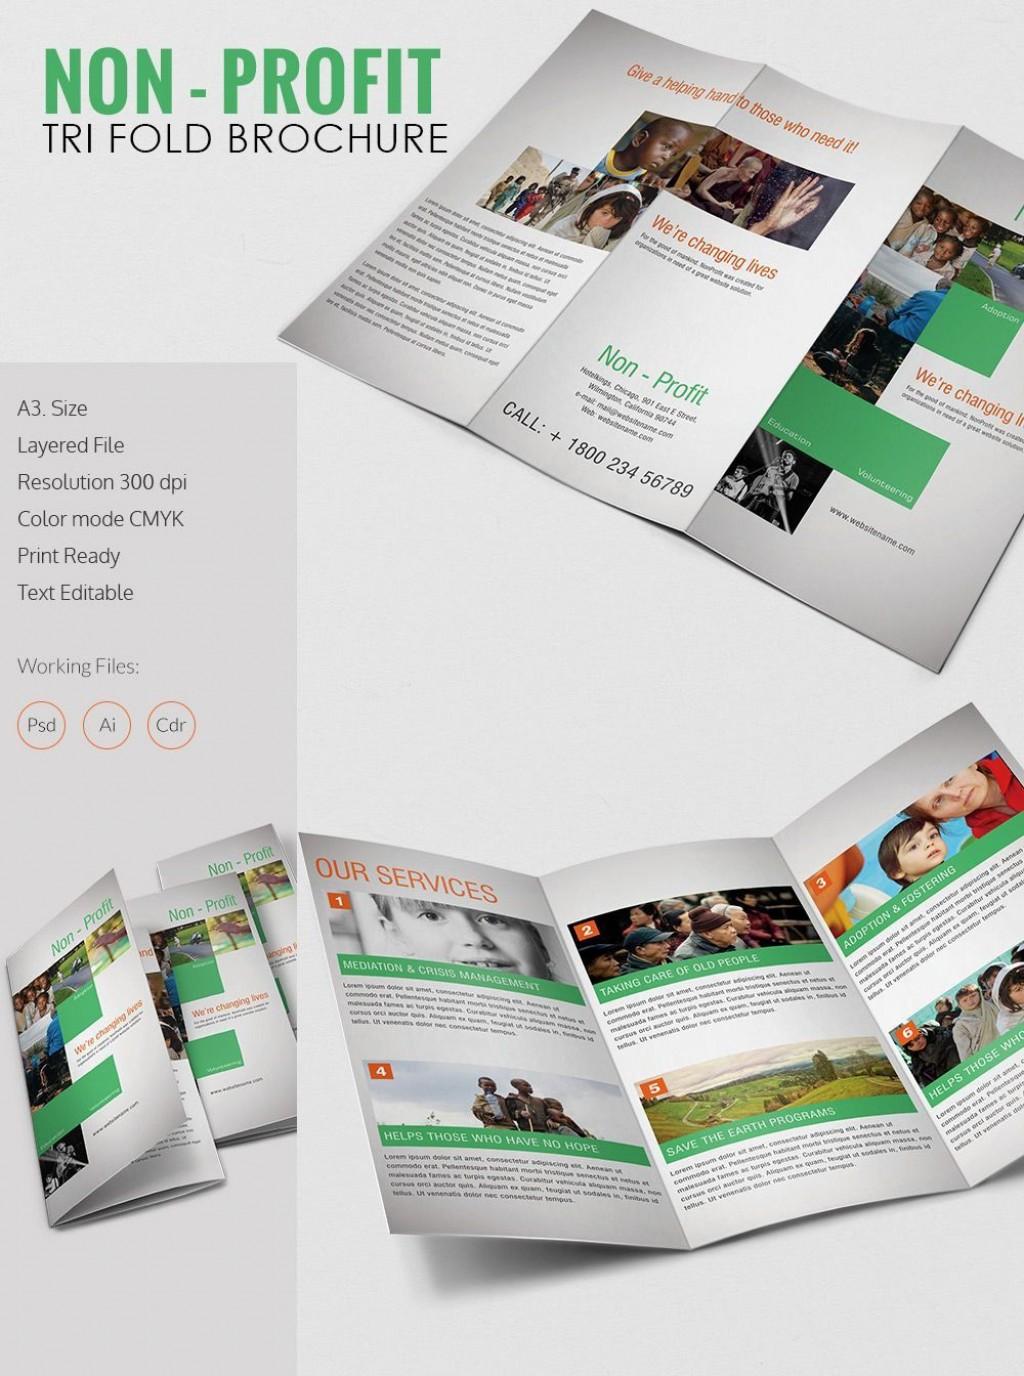 002 Stirring Indesign Trifold Brochure Template Photo  Tri Fold A4 Bi Free DownloadLarge